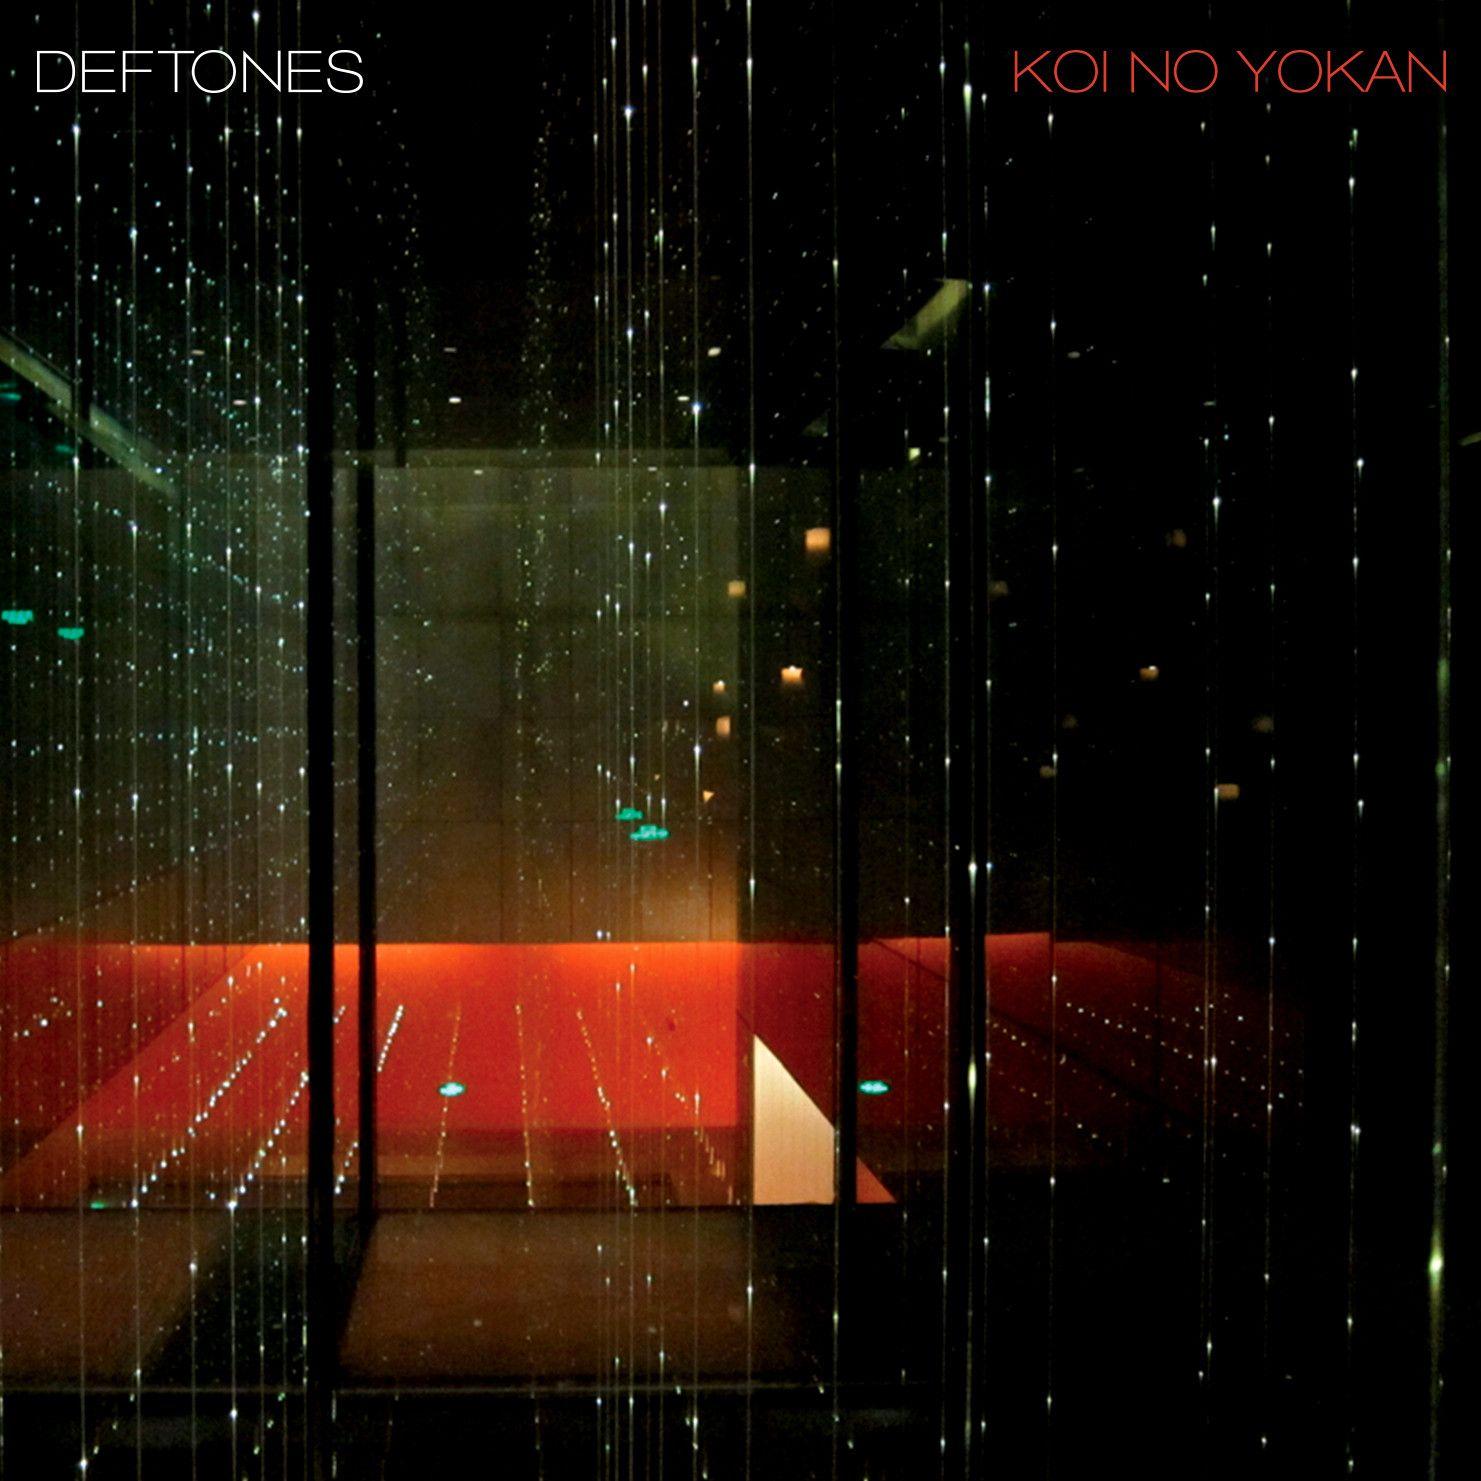 Deftones - Koi No Yokan album cover